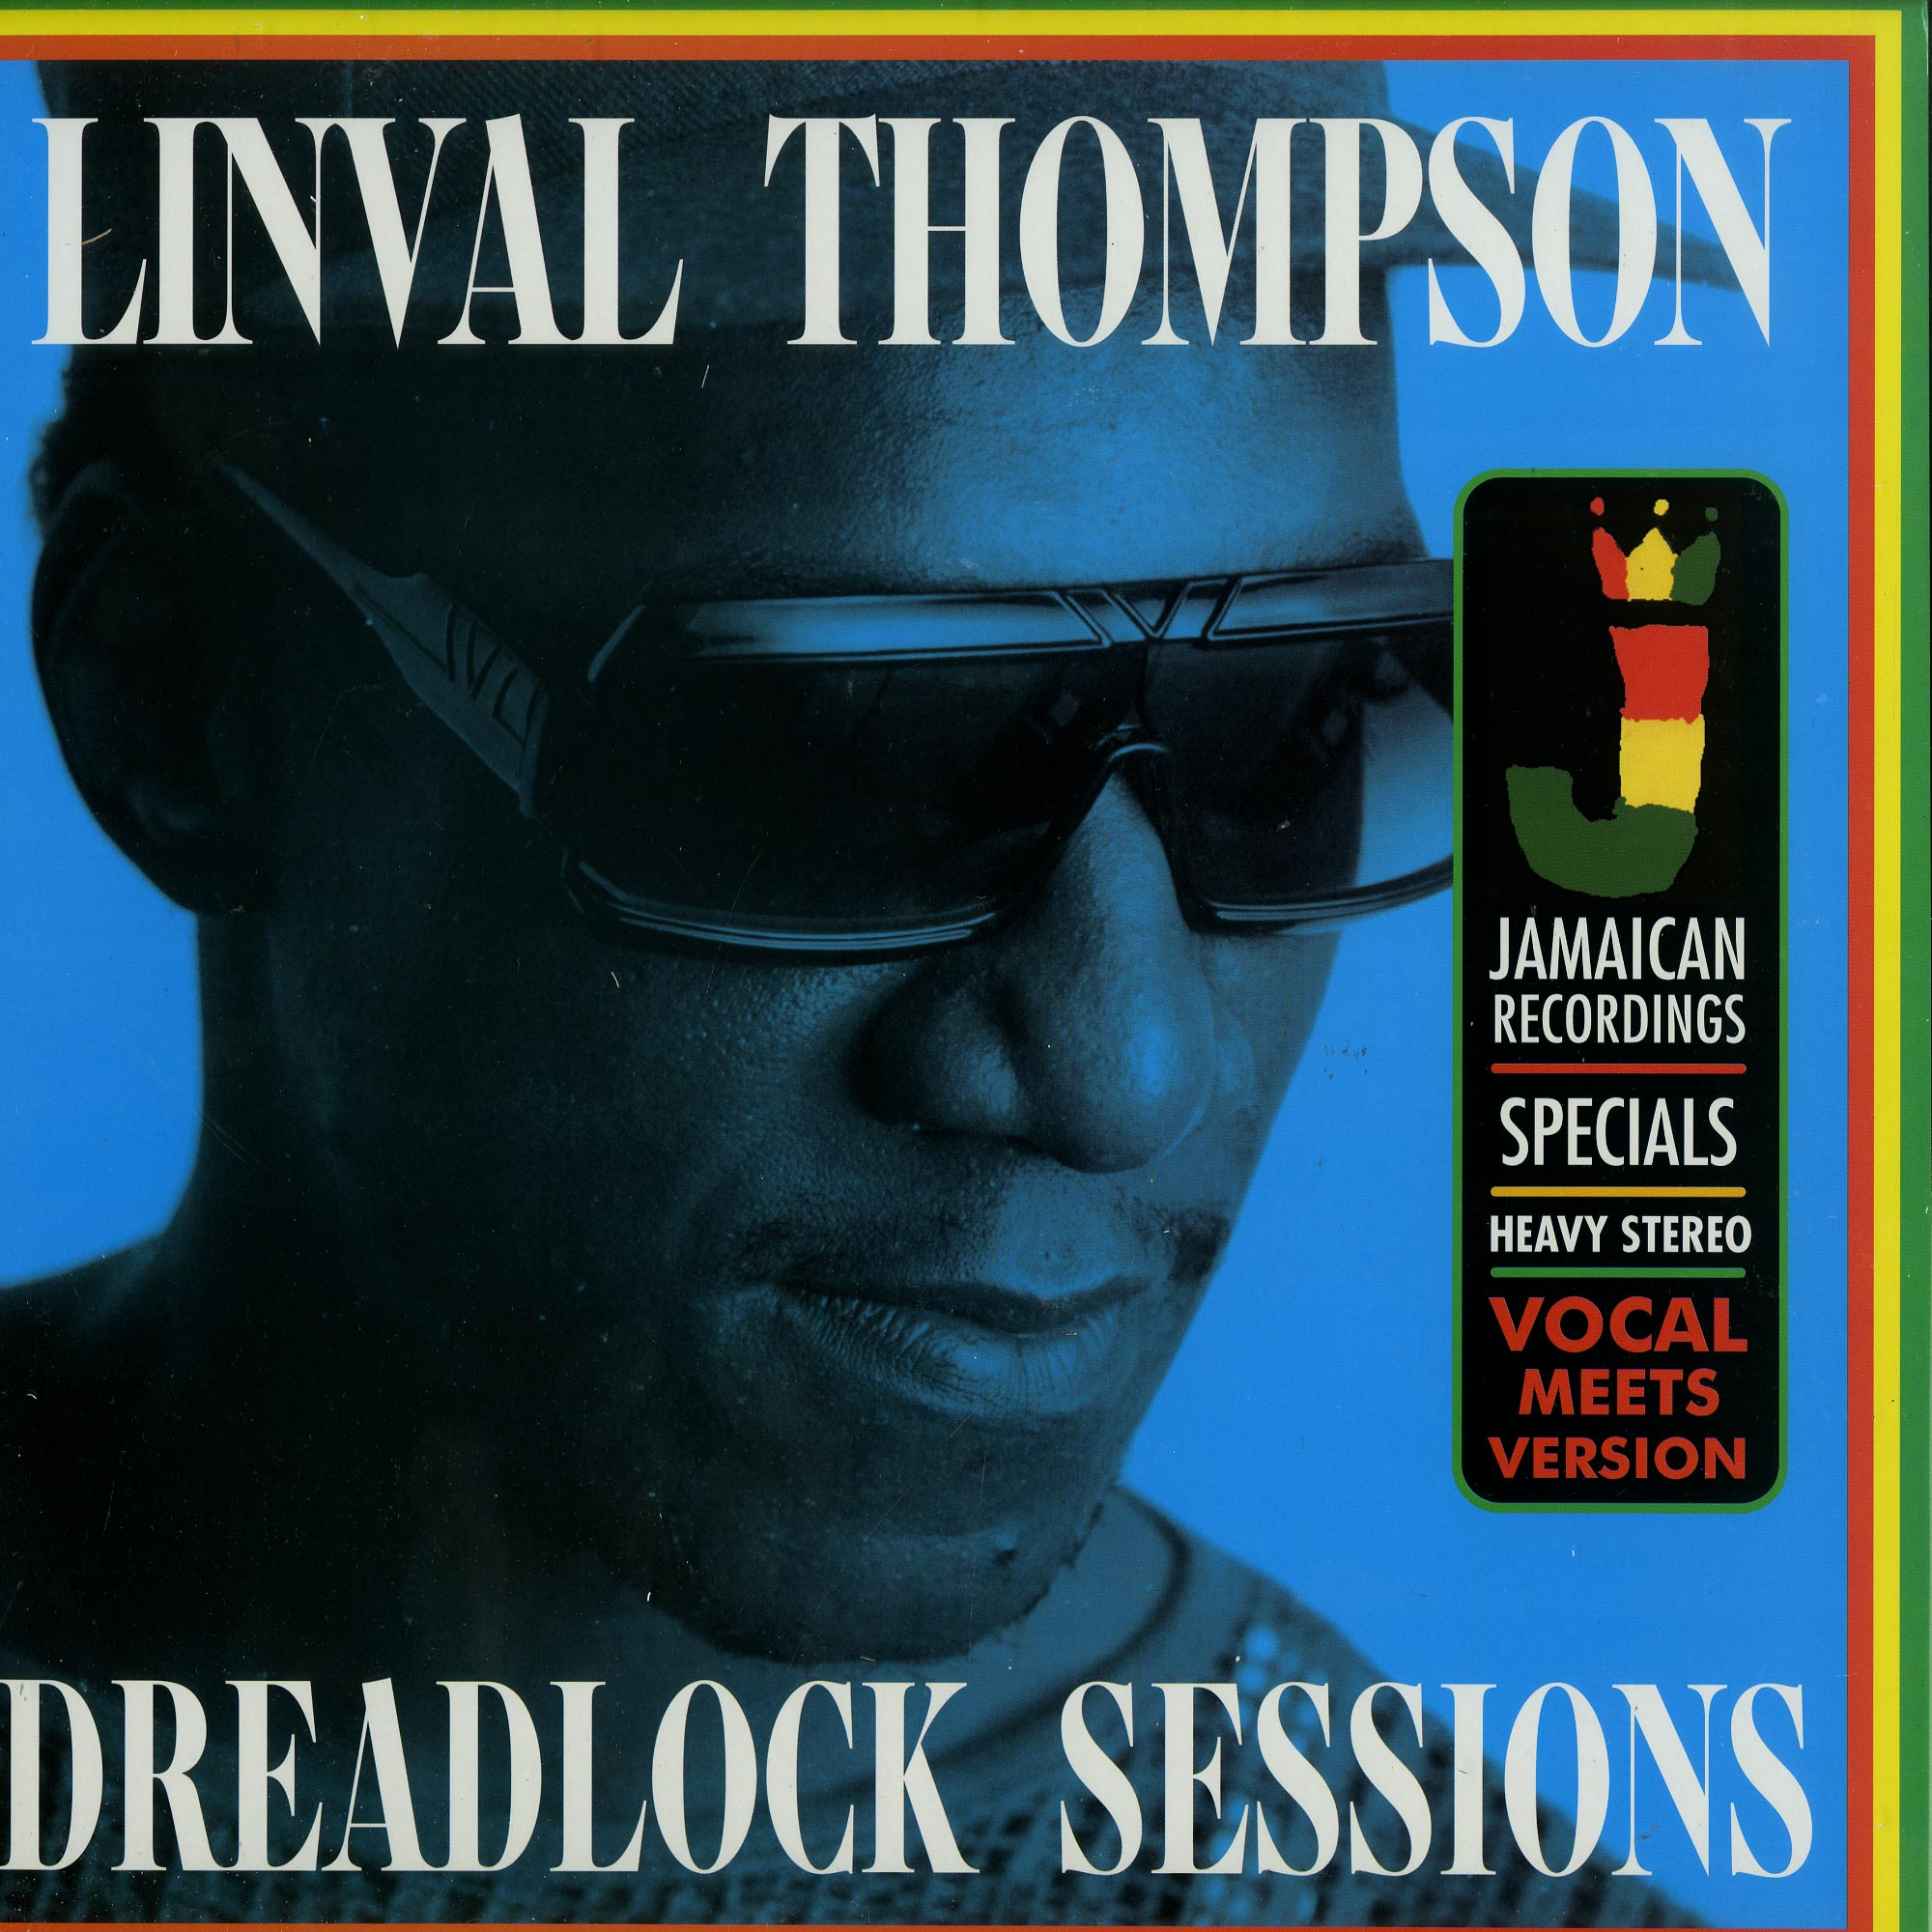 Linval Thompson - DREADLOCK SESSIONS